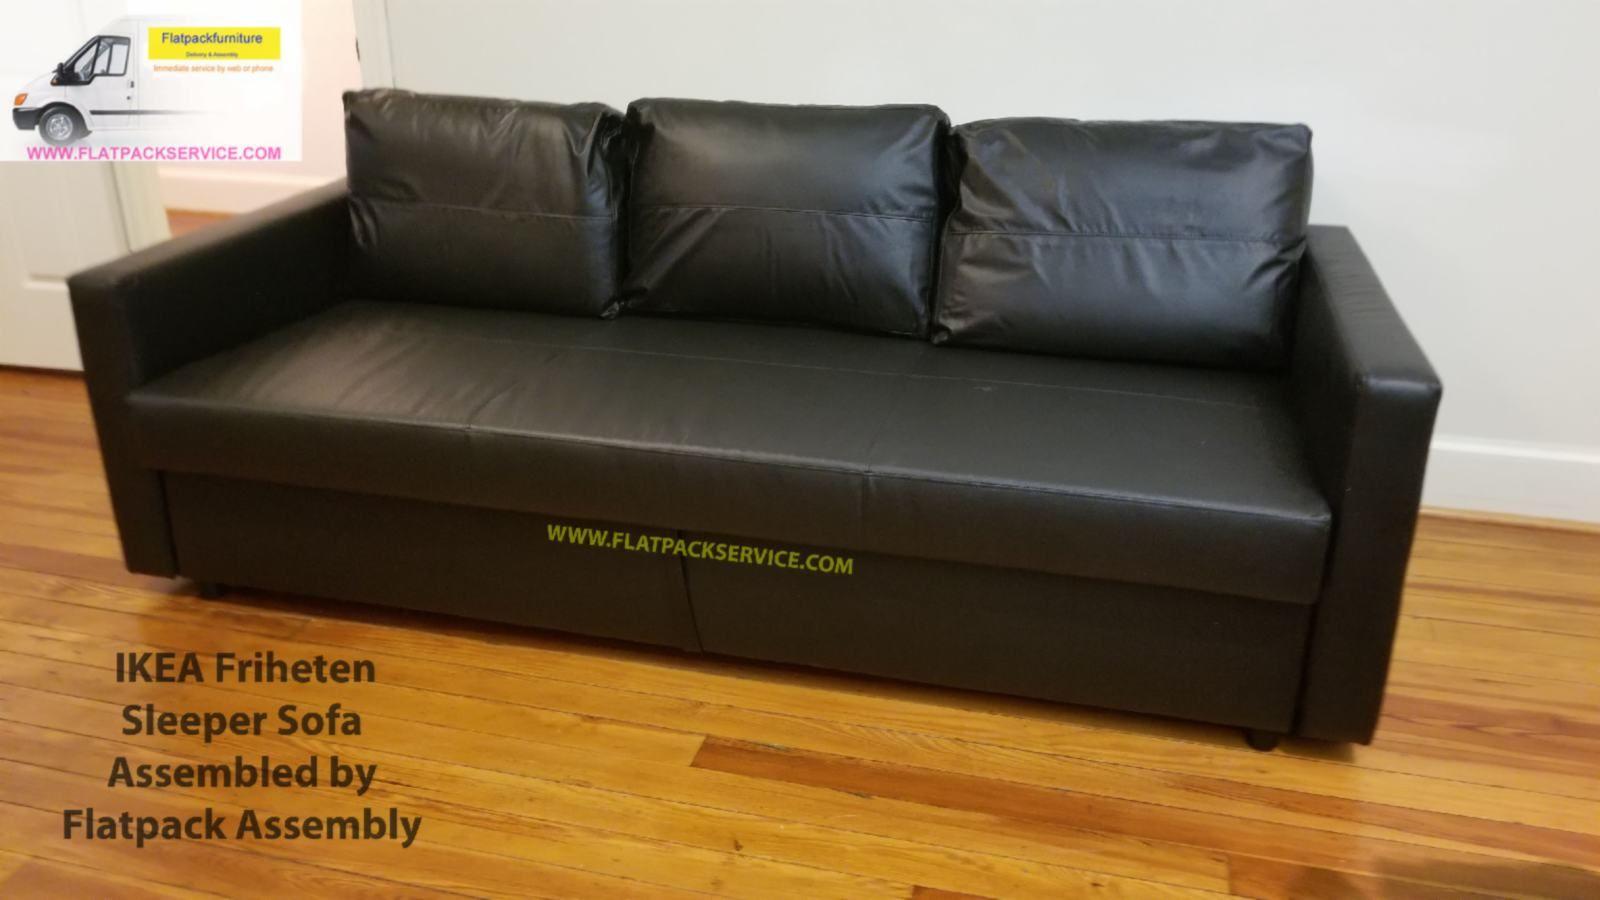 Friheten Sleeper Sofa Black Article Number 603 411 38 Assembled By Flatpack Assembly 240